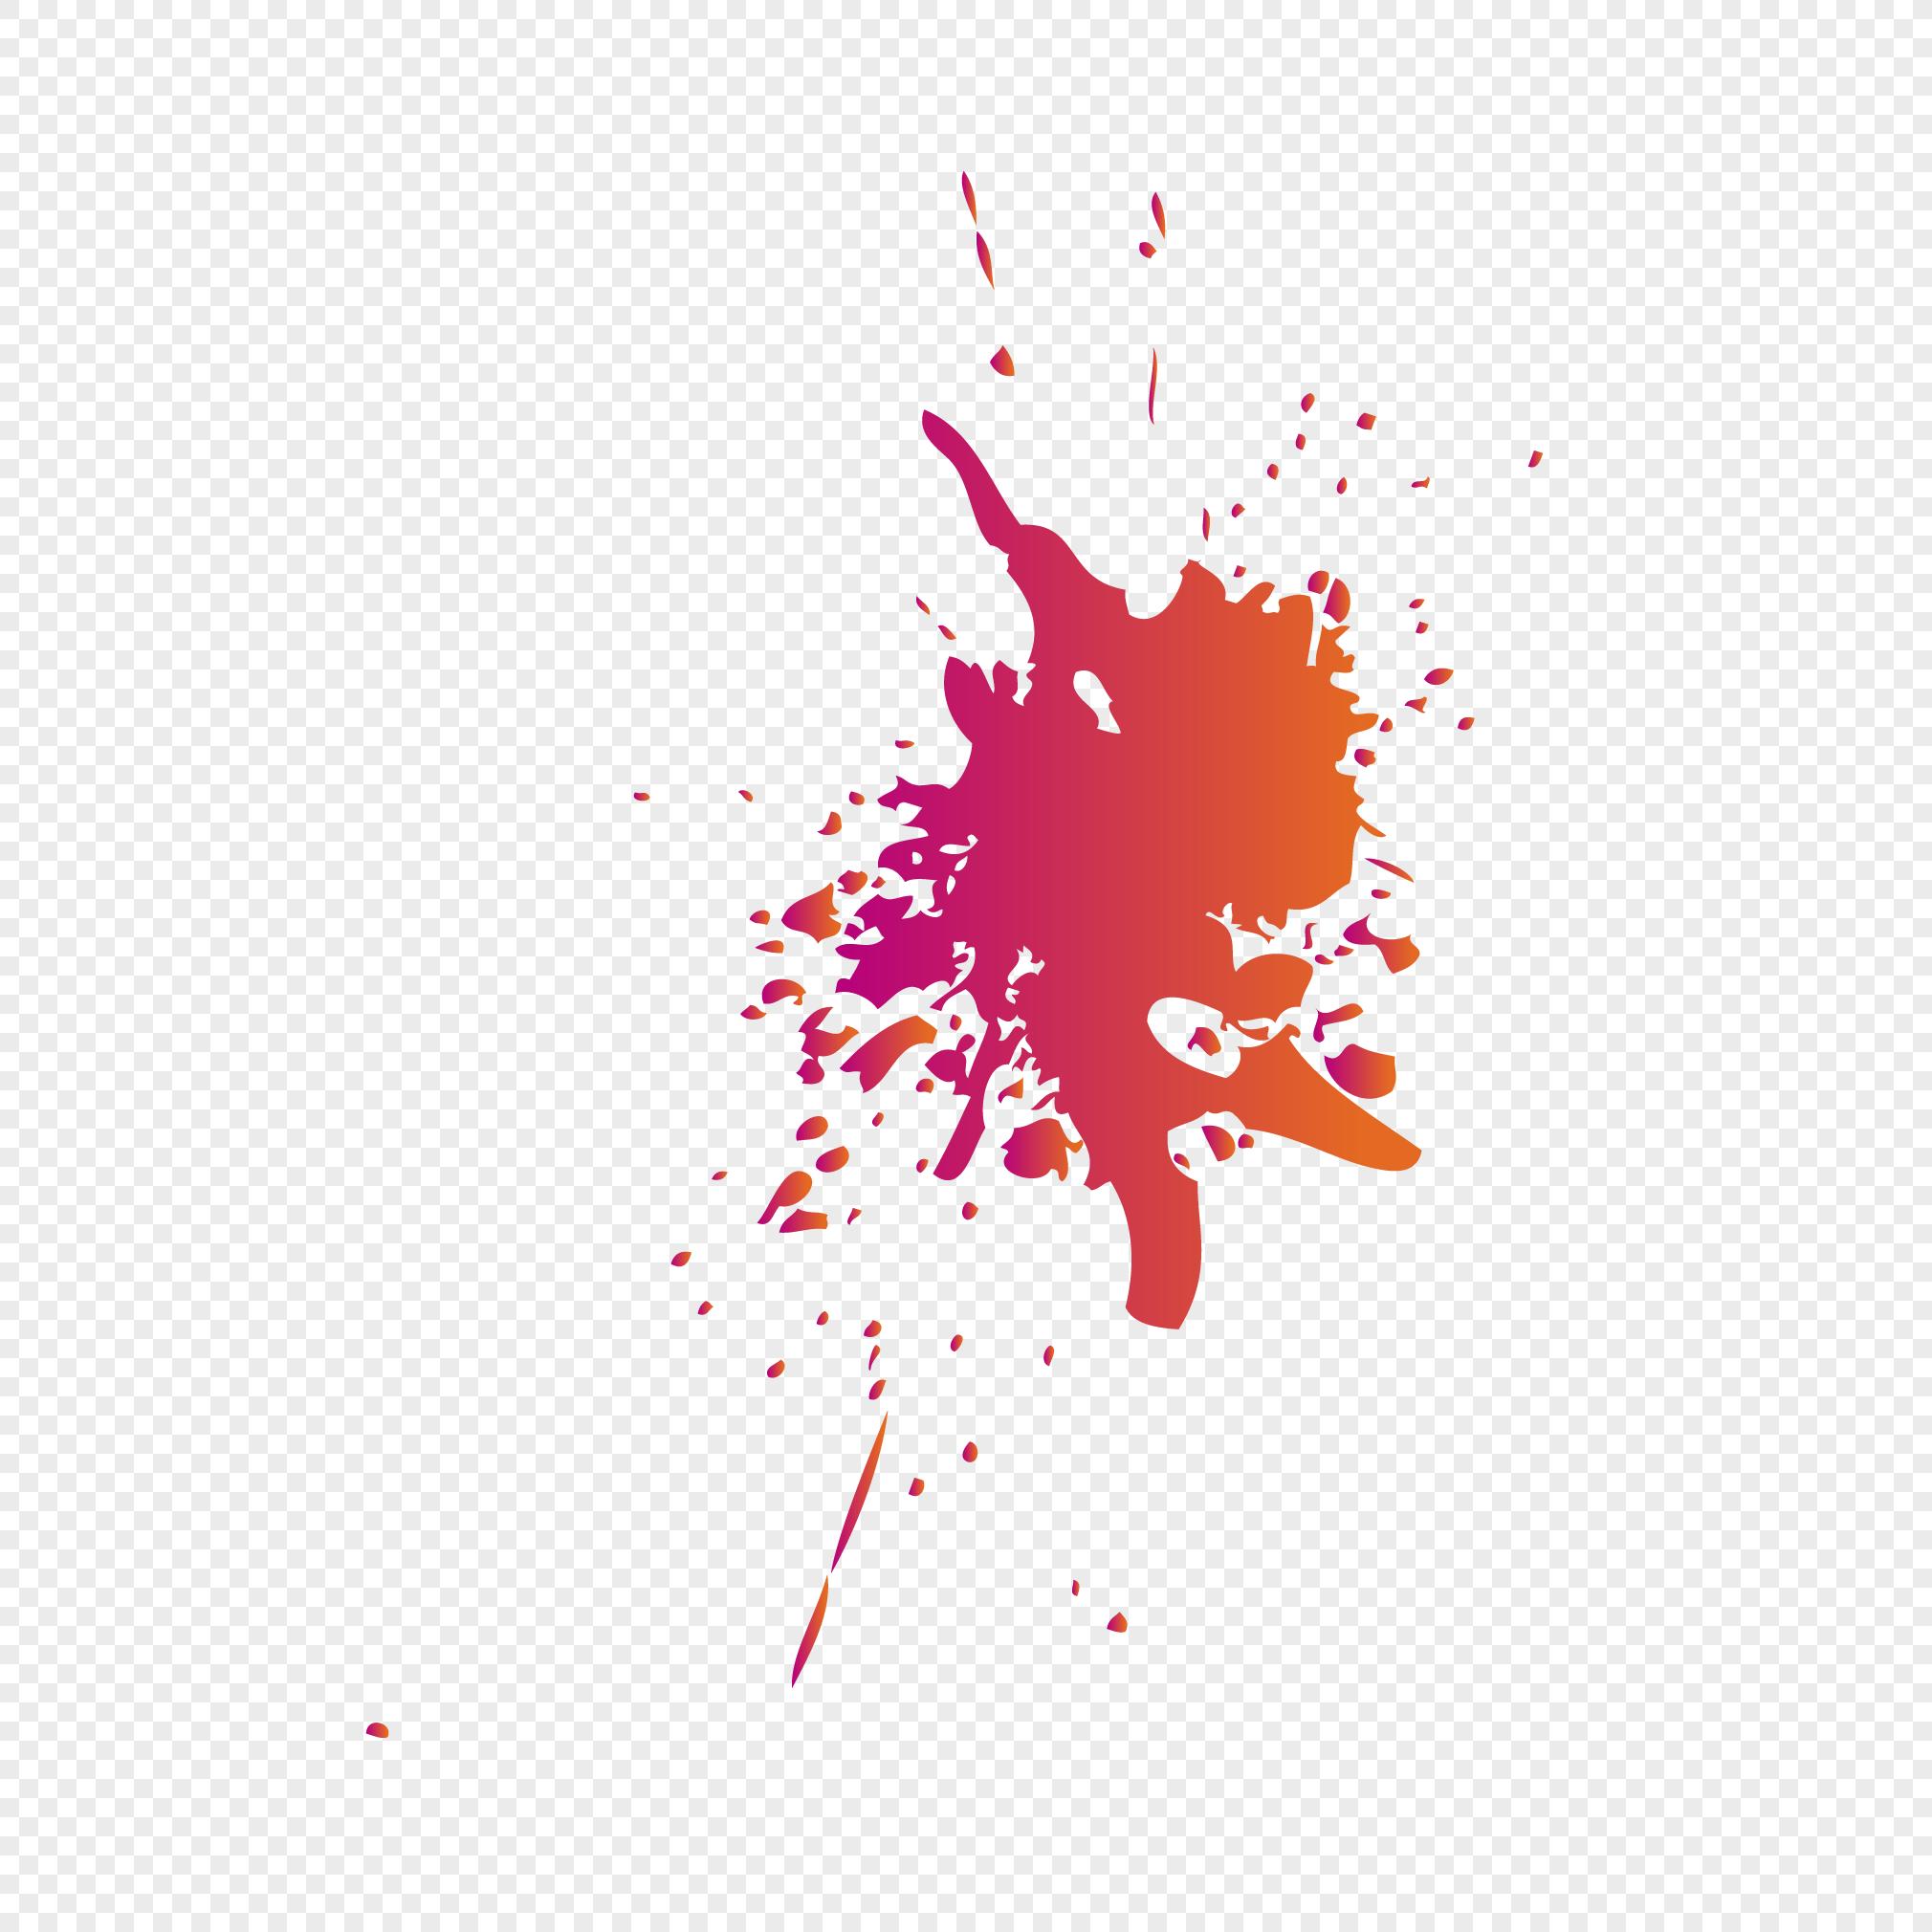 Color splash royalty-free paint splash png download 2244*2195.